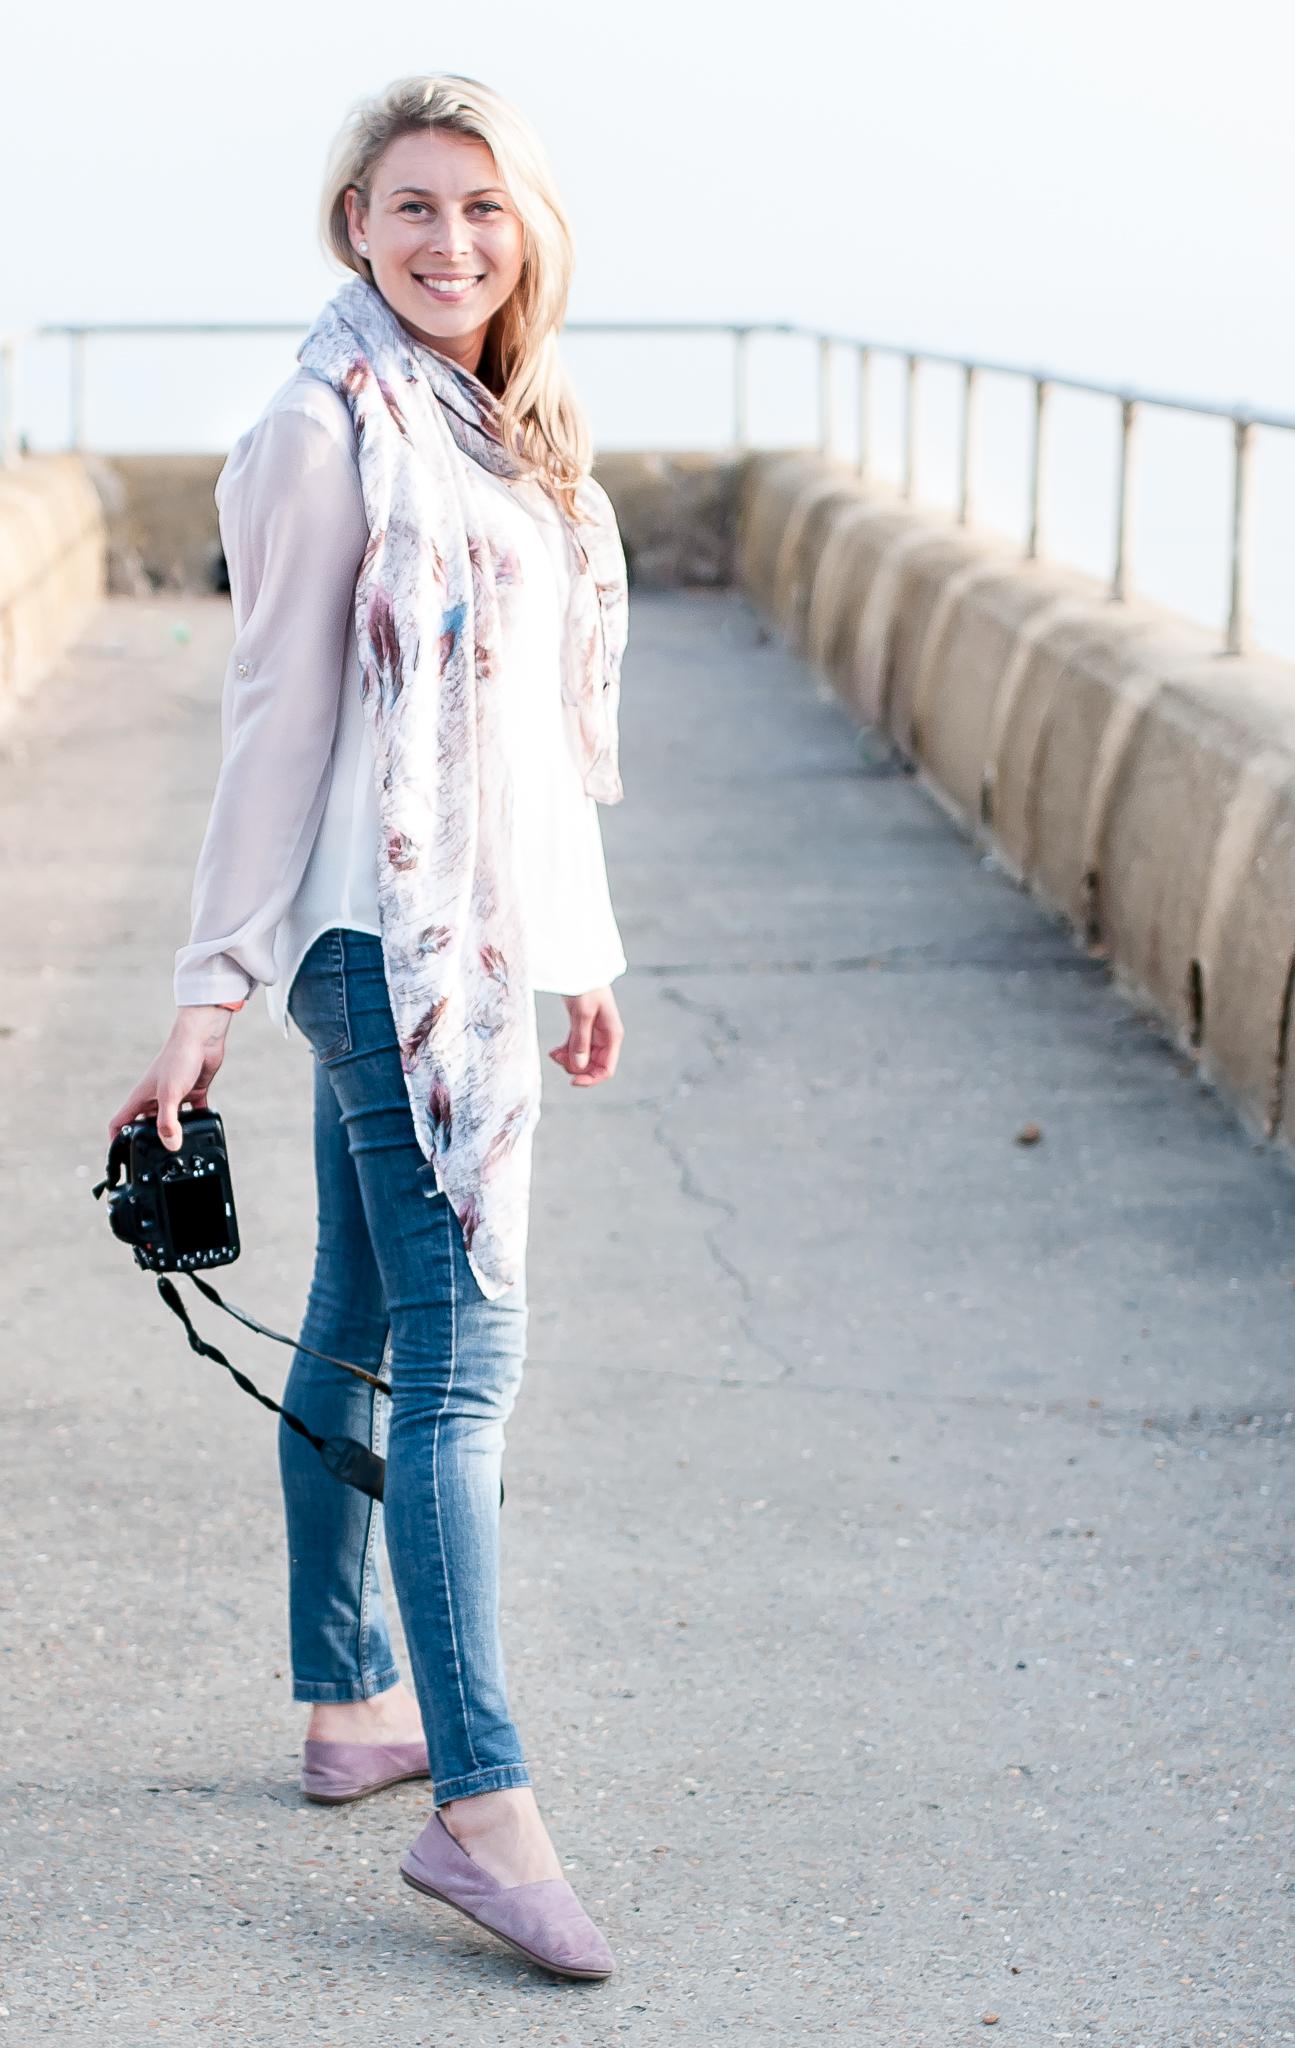 International Professional Personal Brand Portrait Photographer based in Brighton & London, UK